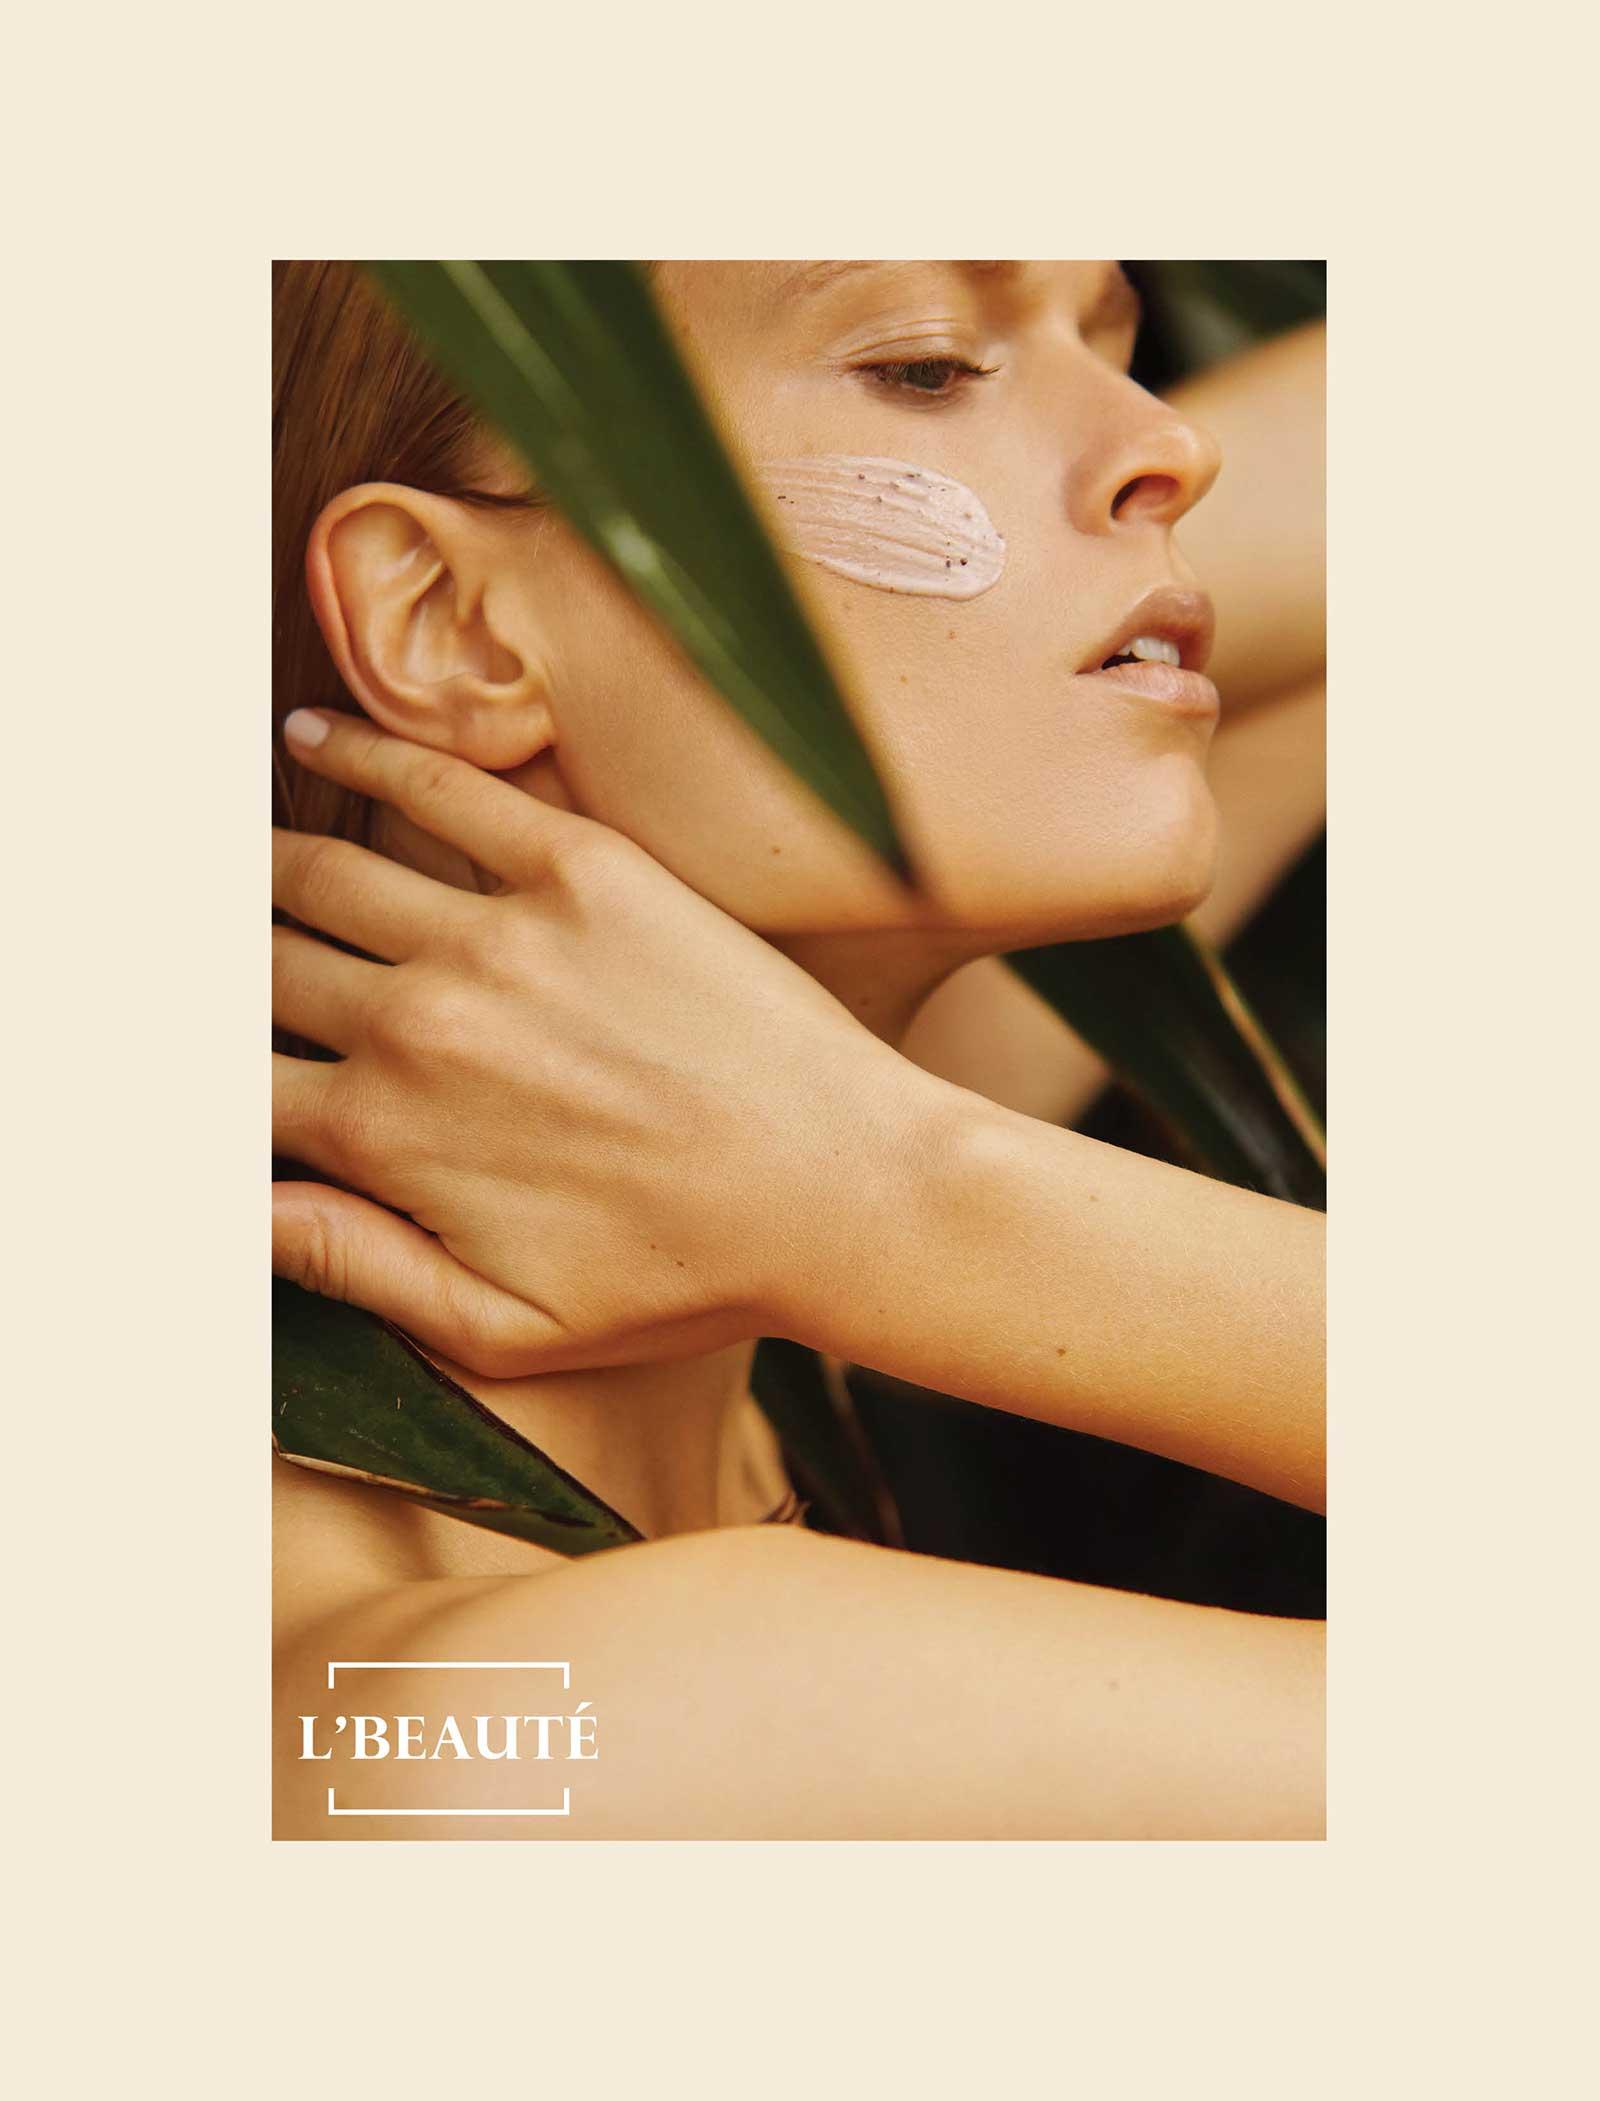 LBeaute-Wellness-Beauty-Cover-Febrero-20218